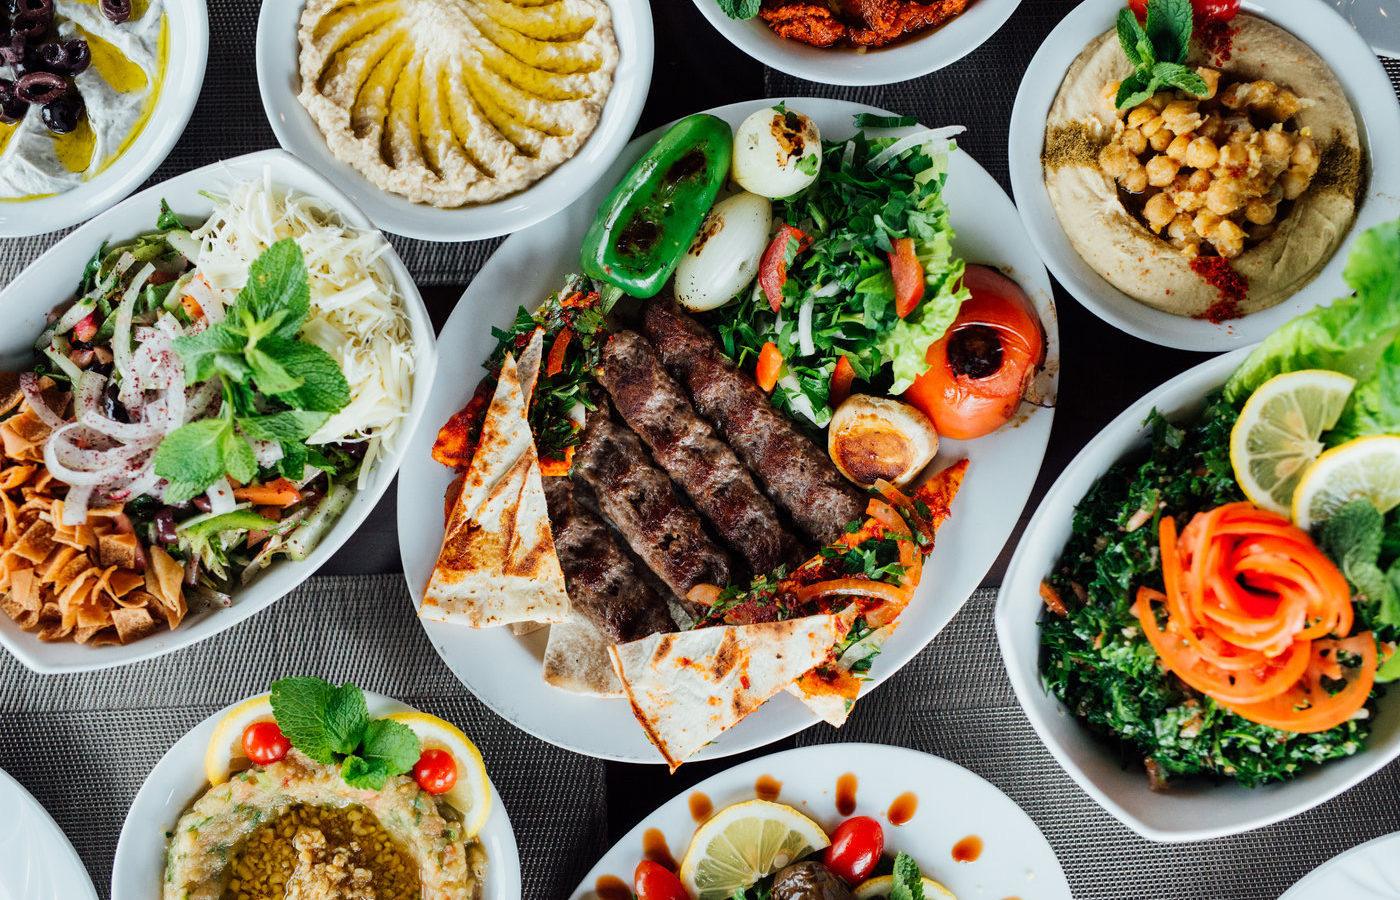 Les meilleurs restaurants du Moyen-Orient